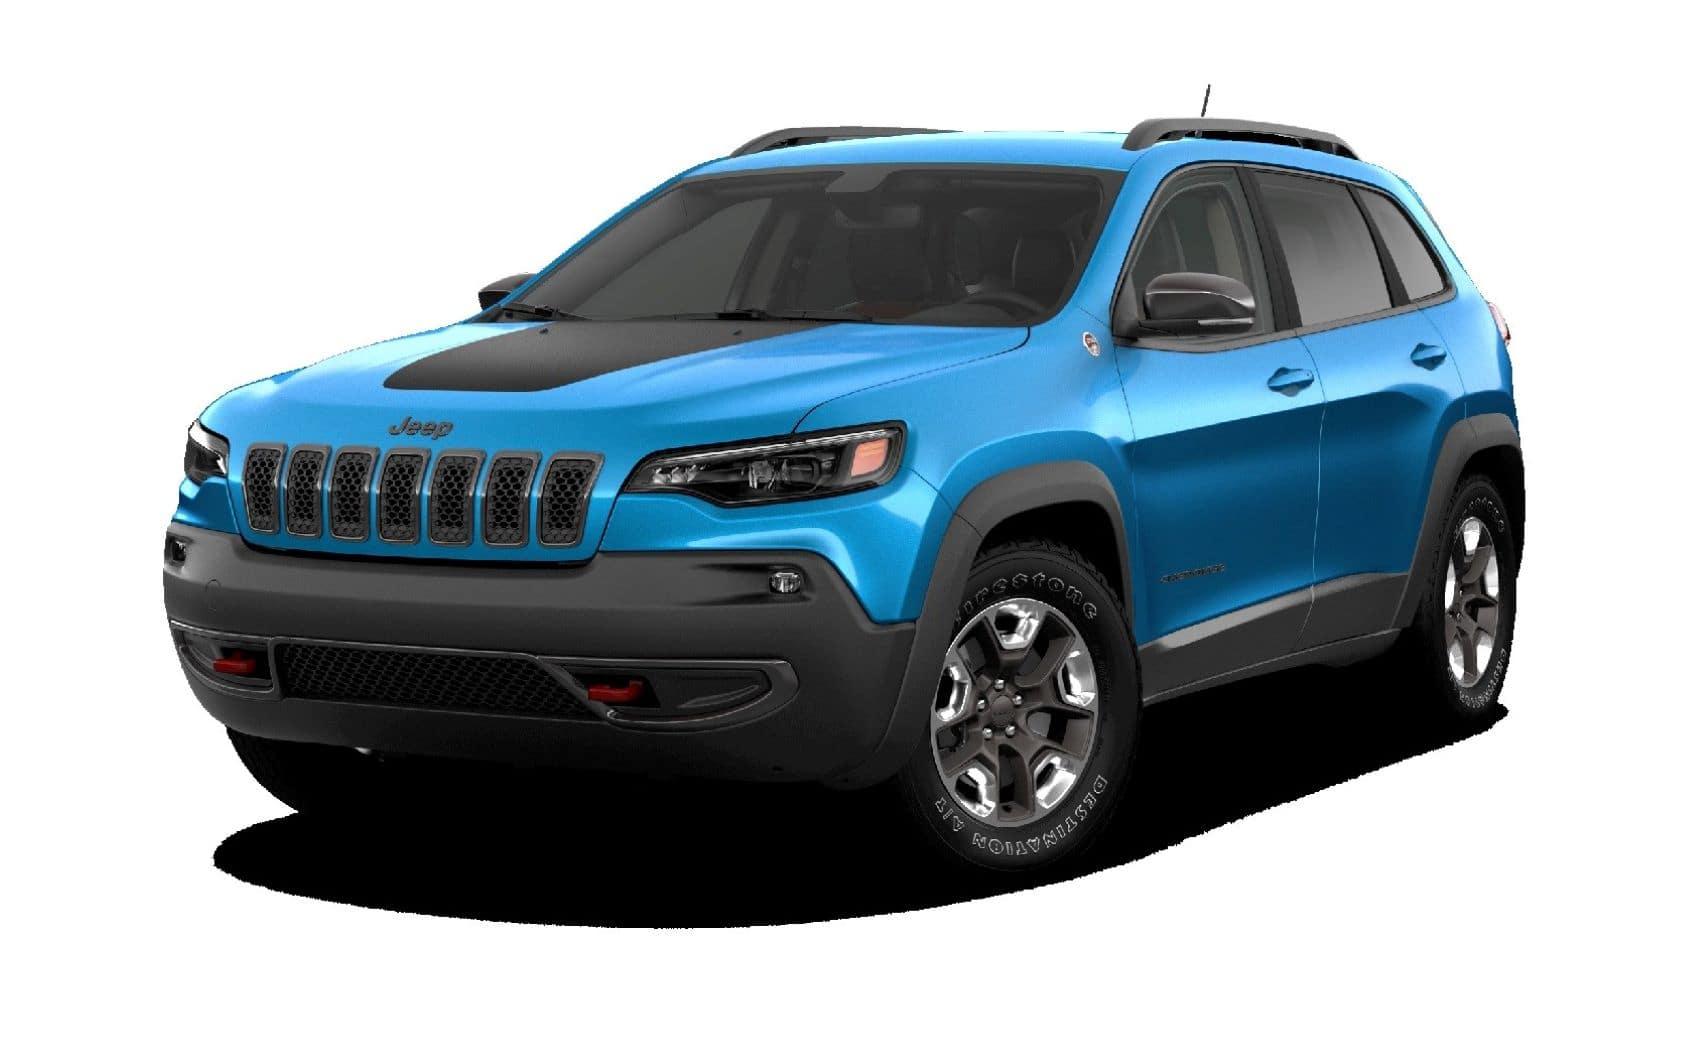 Hydro Blue Jeep Cherokee SUV